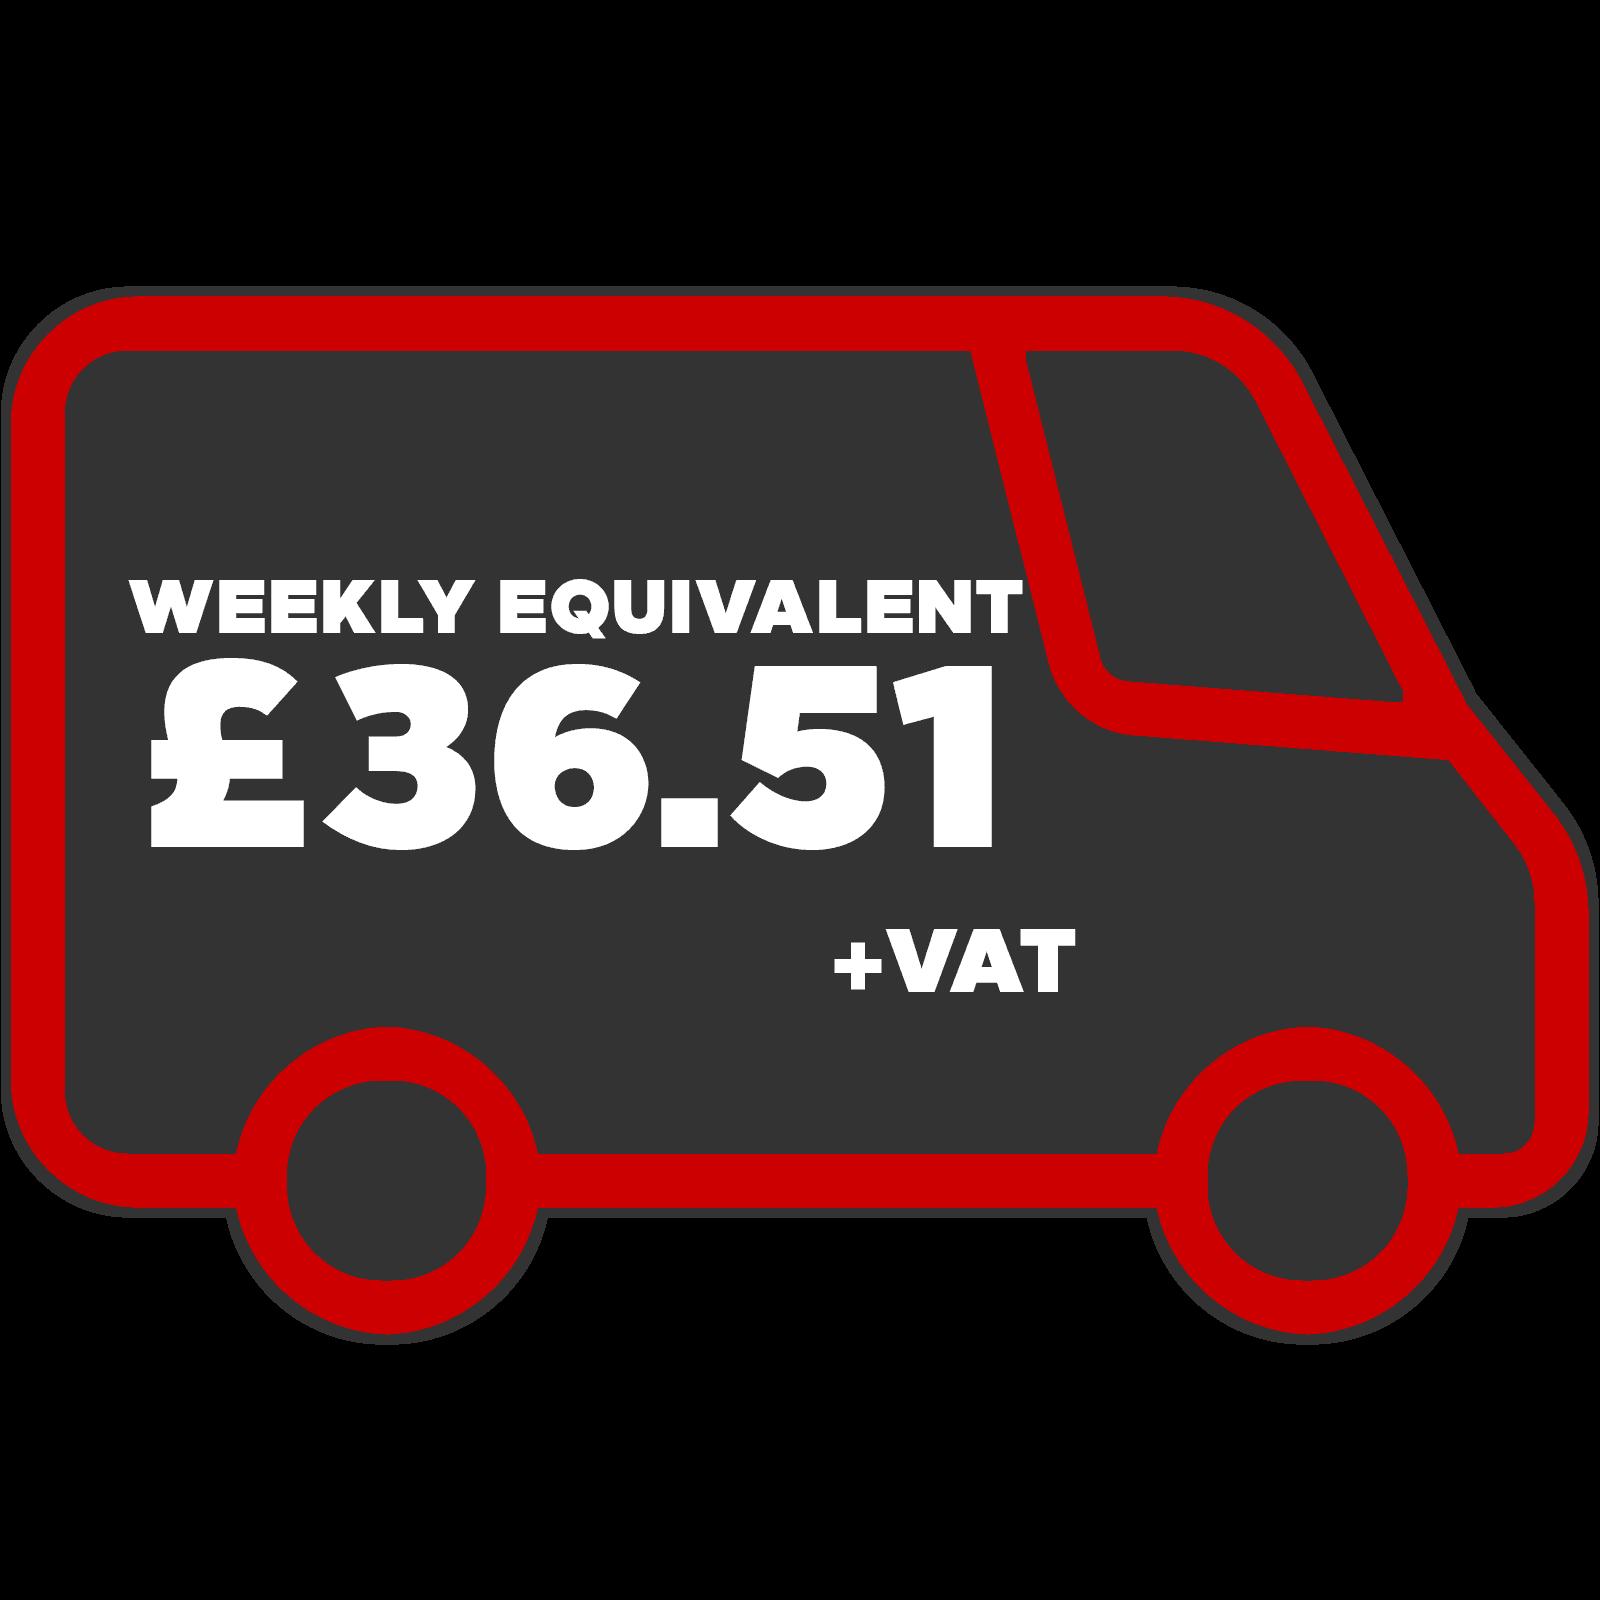 Vauxhall Combo 10k Per Annum Weekly